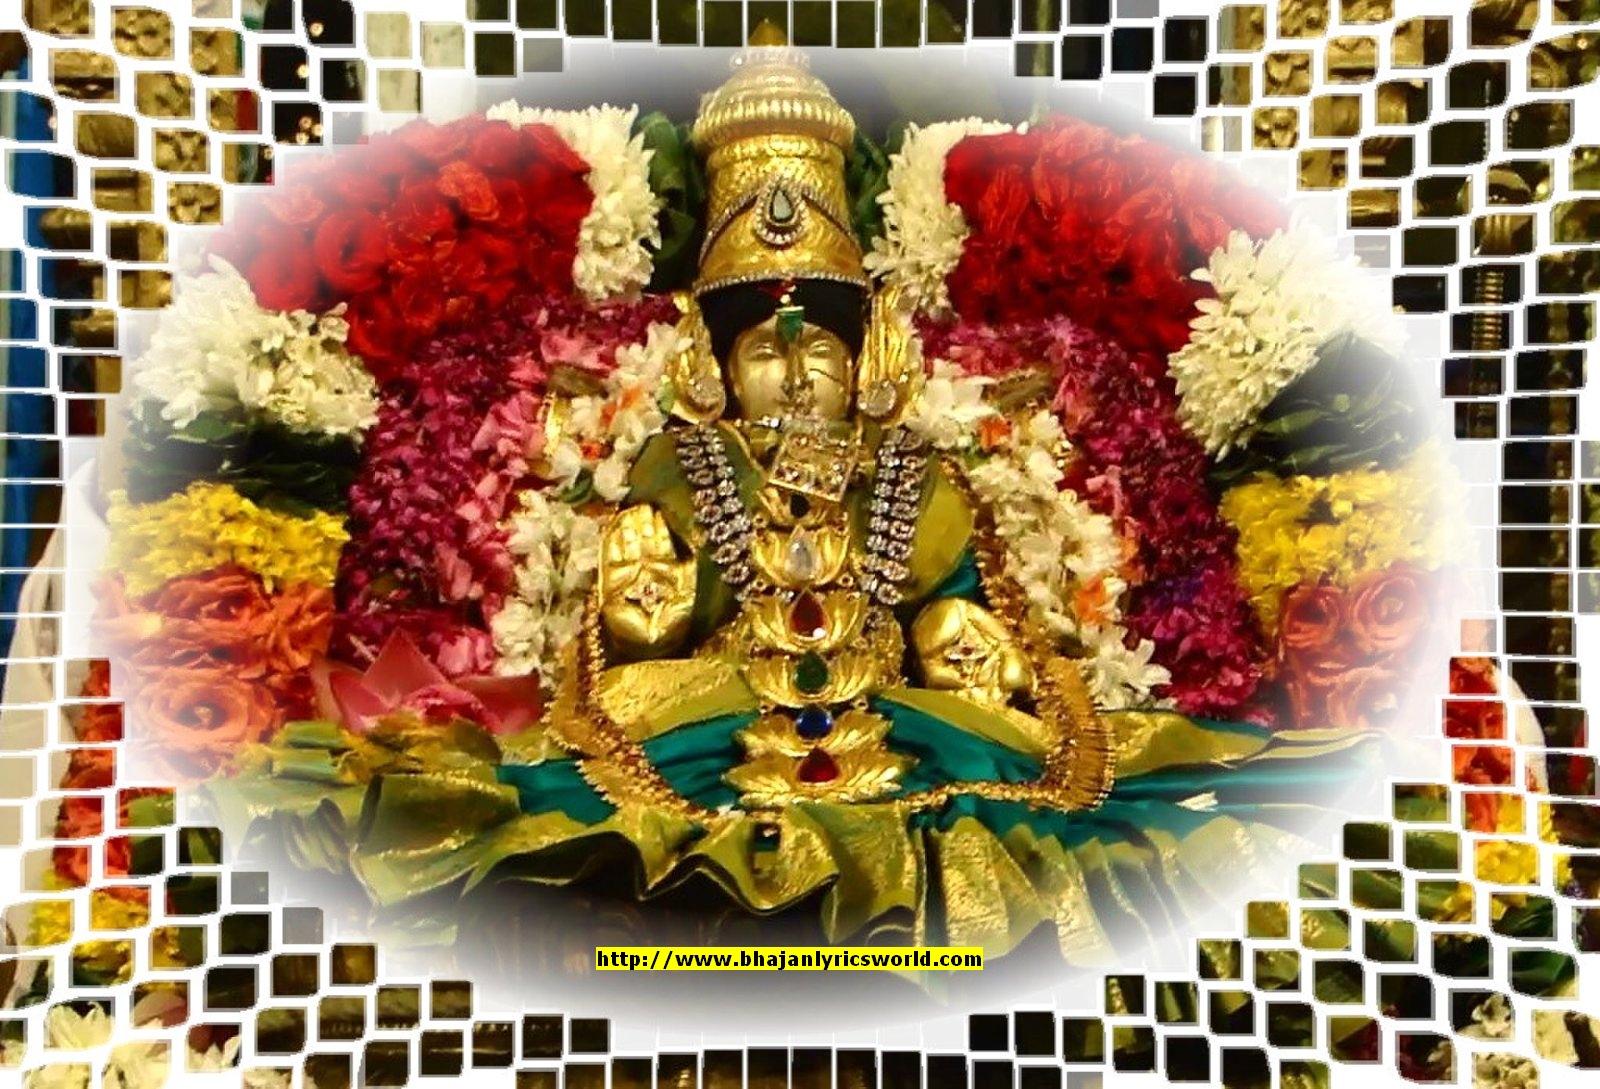 Amma Janani Charanalayam Nee -Tamil Song - English Lyrics   Bhajan